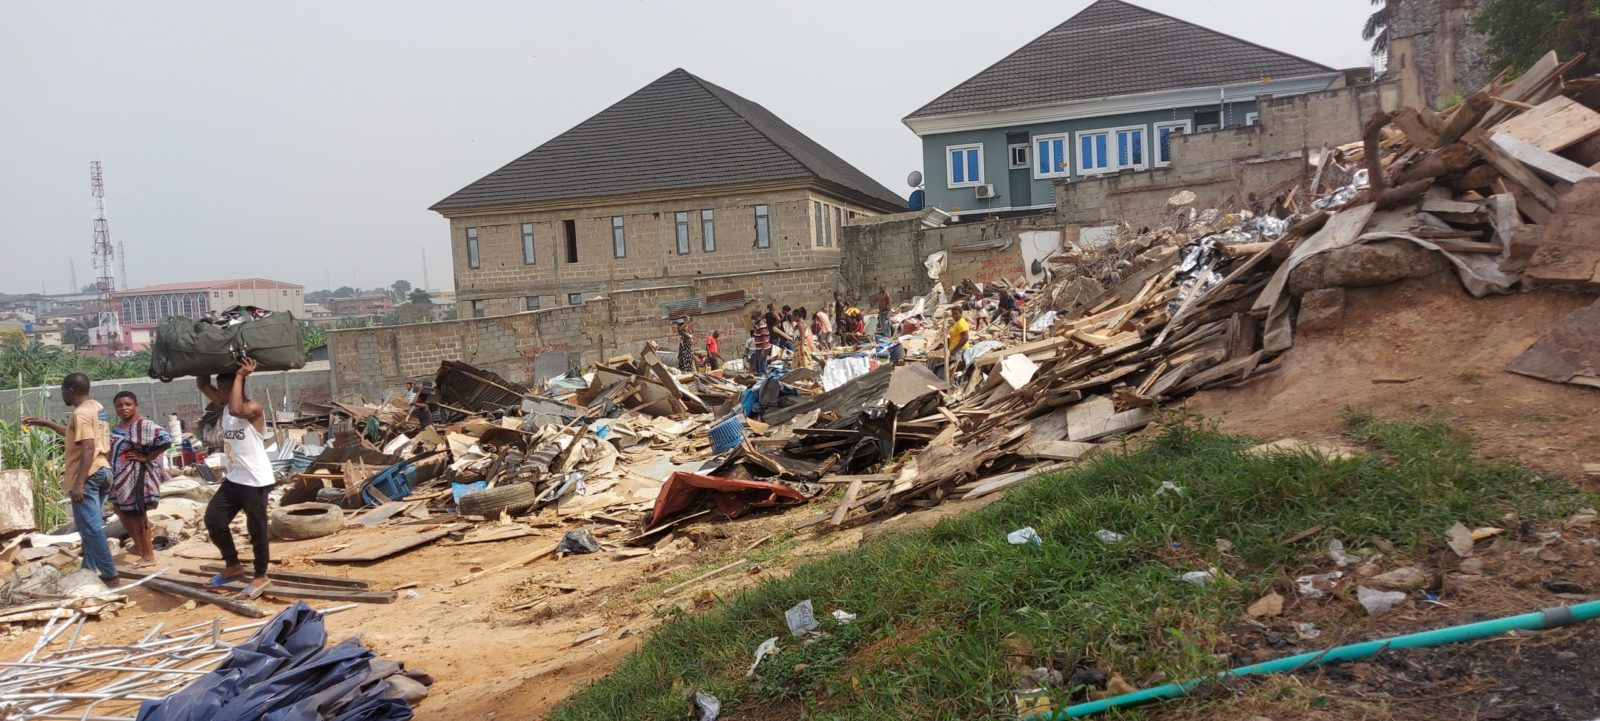 Ruins of Monkey Village, Opebi after demolition